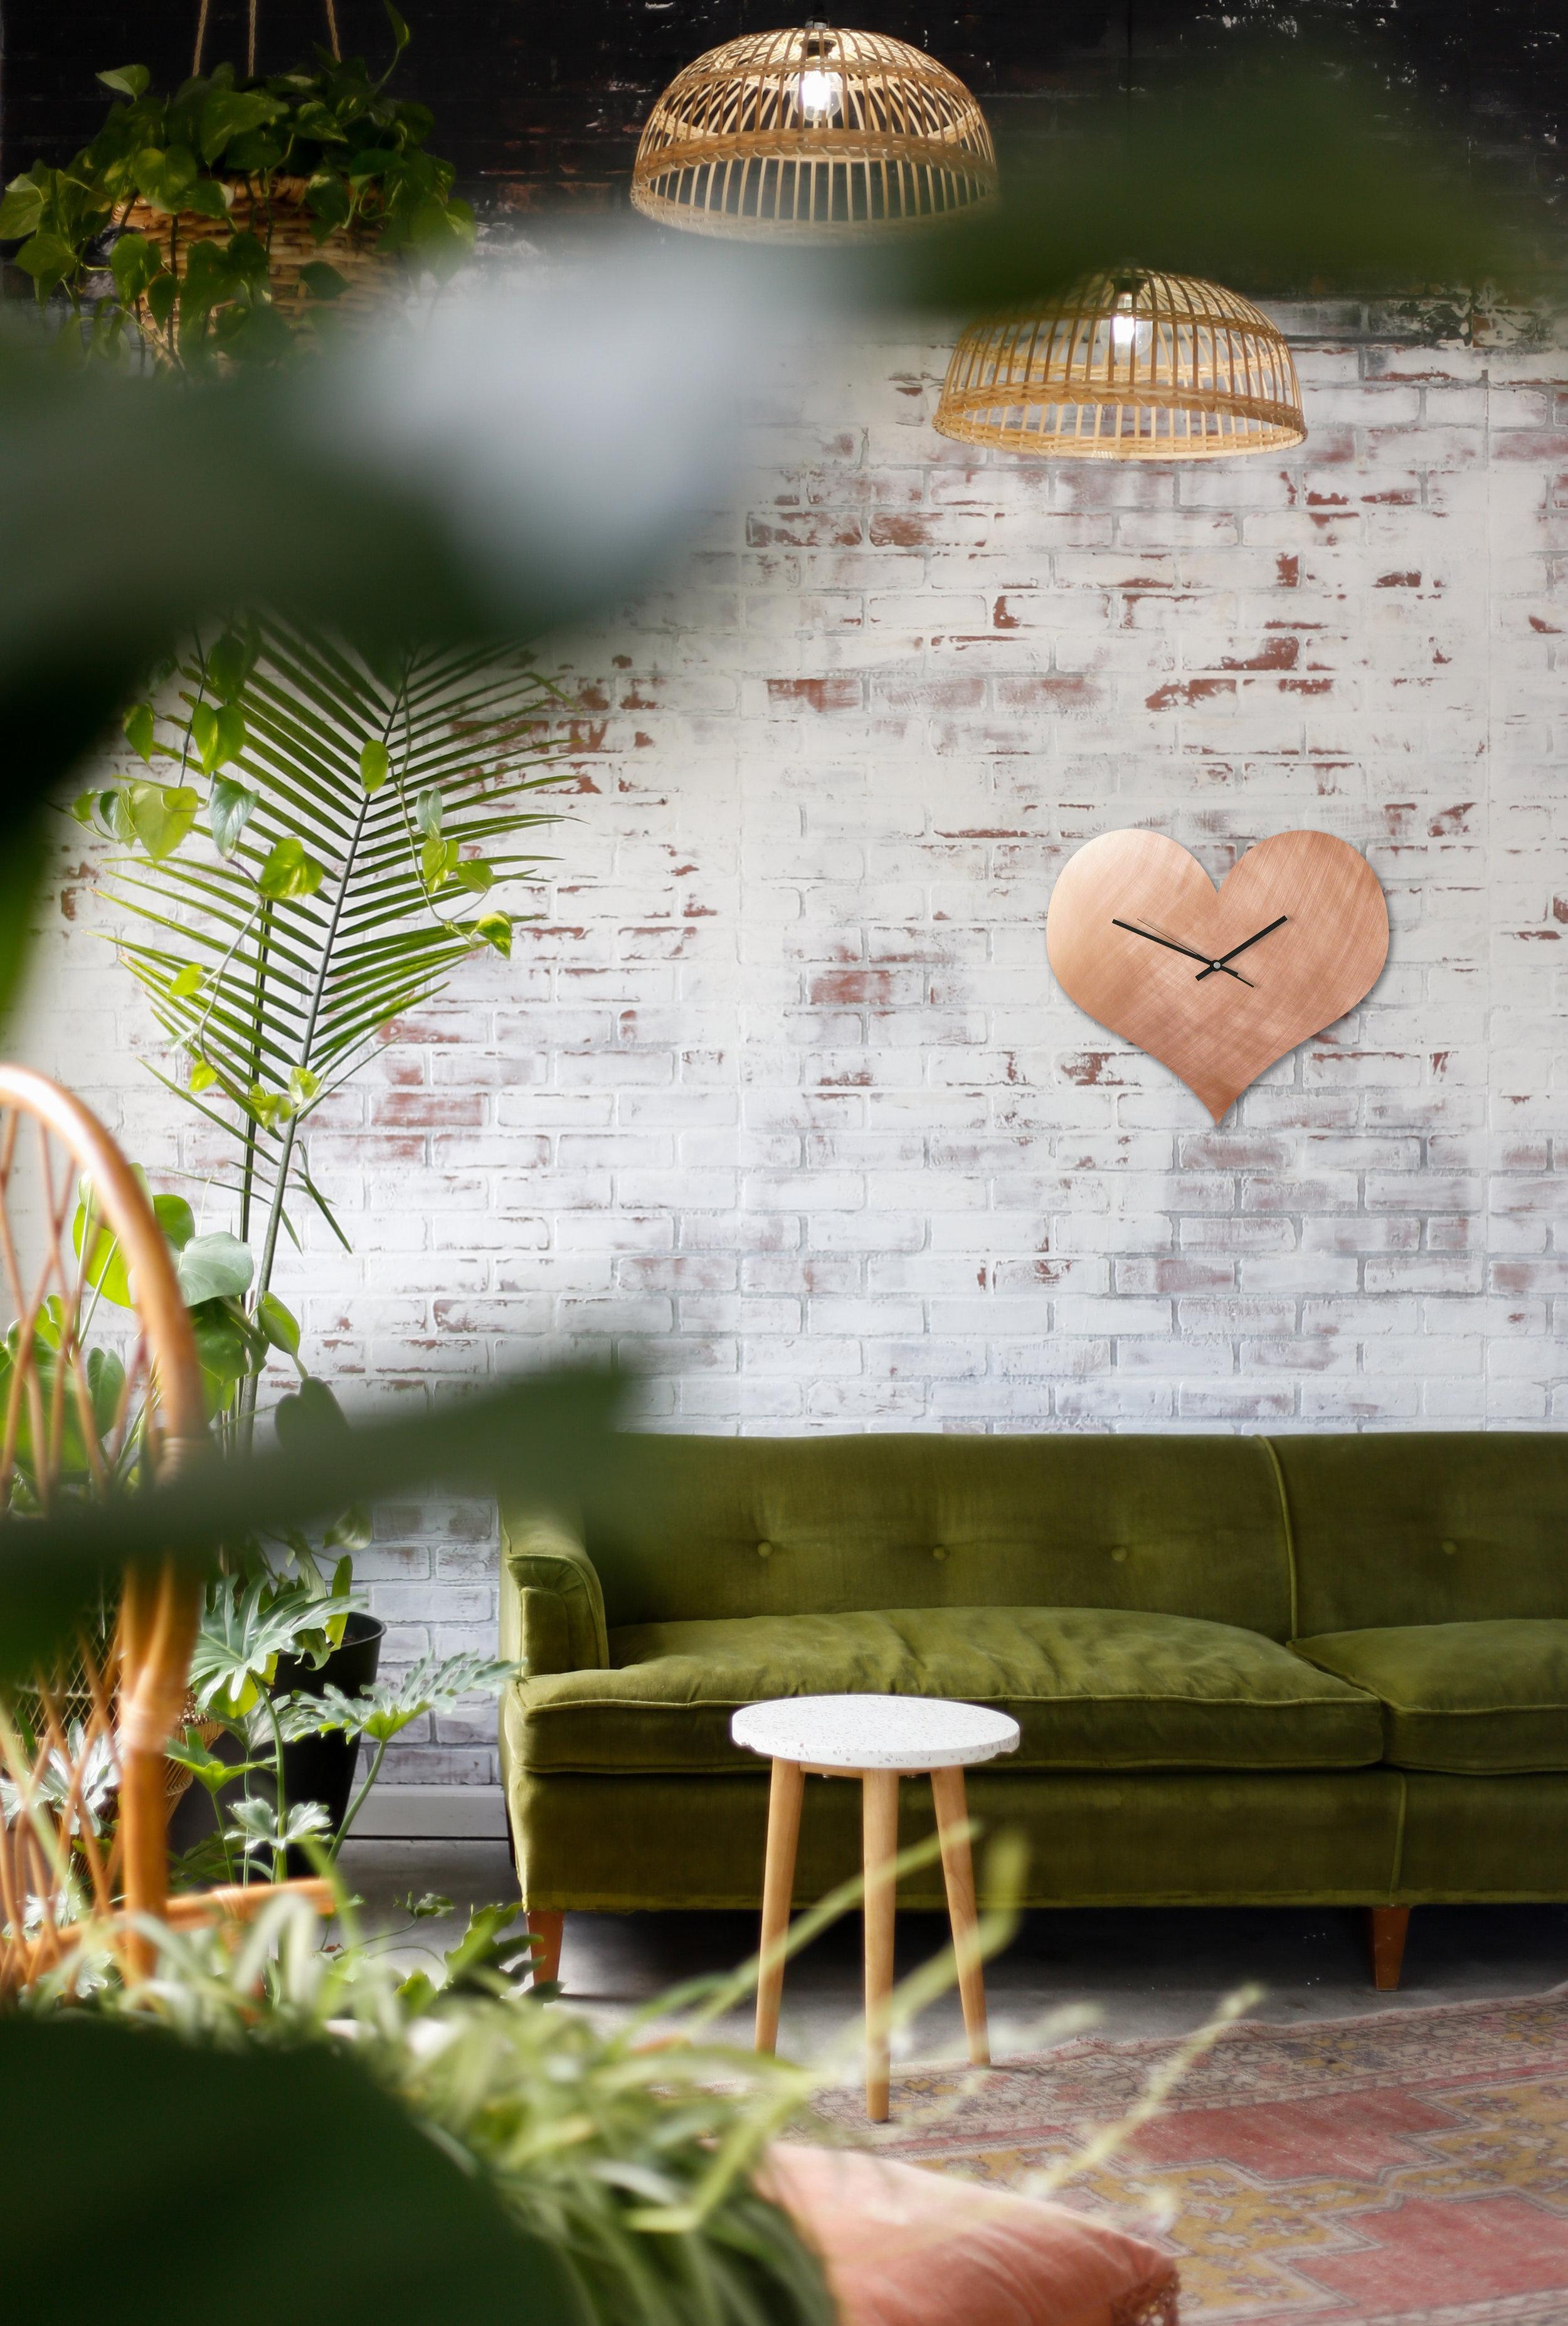 Herz Kupfer Uhr Brick Wall Sofa grün.jpg